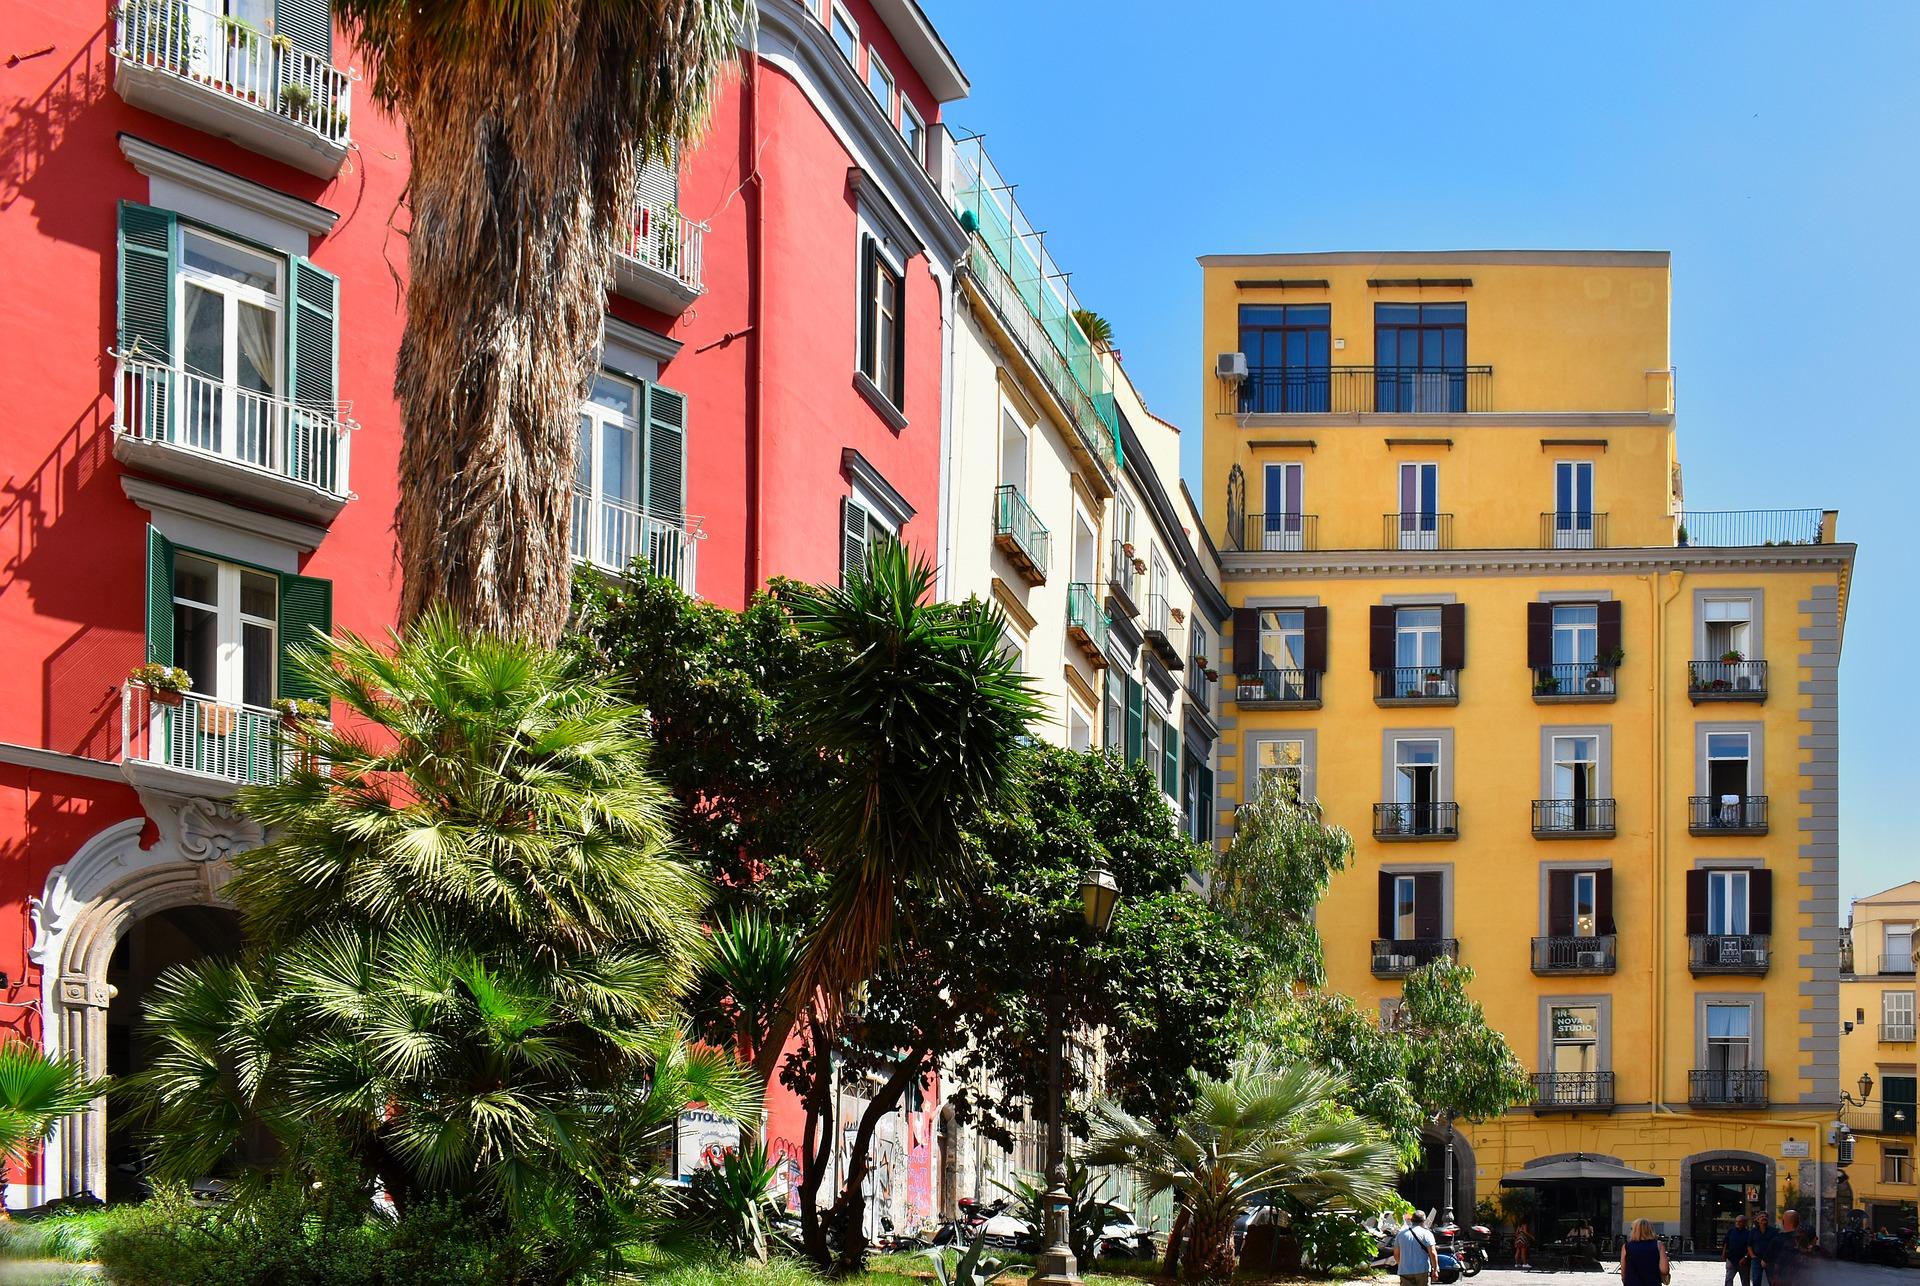 Италия. Уютная улочка.